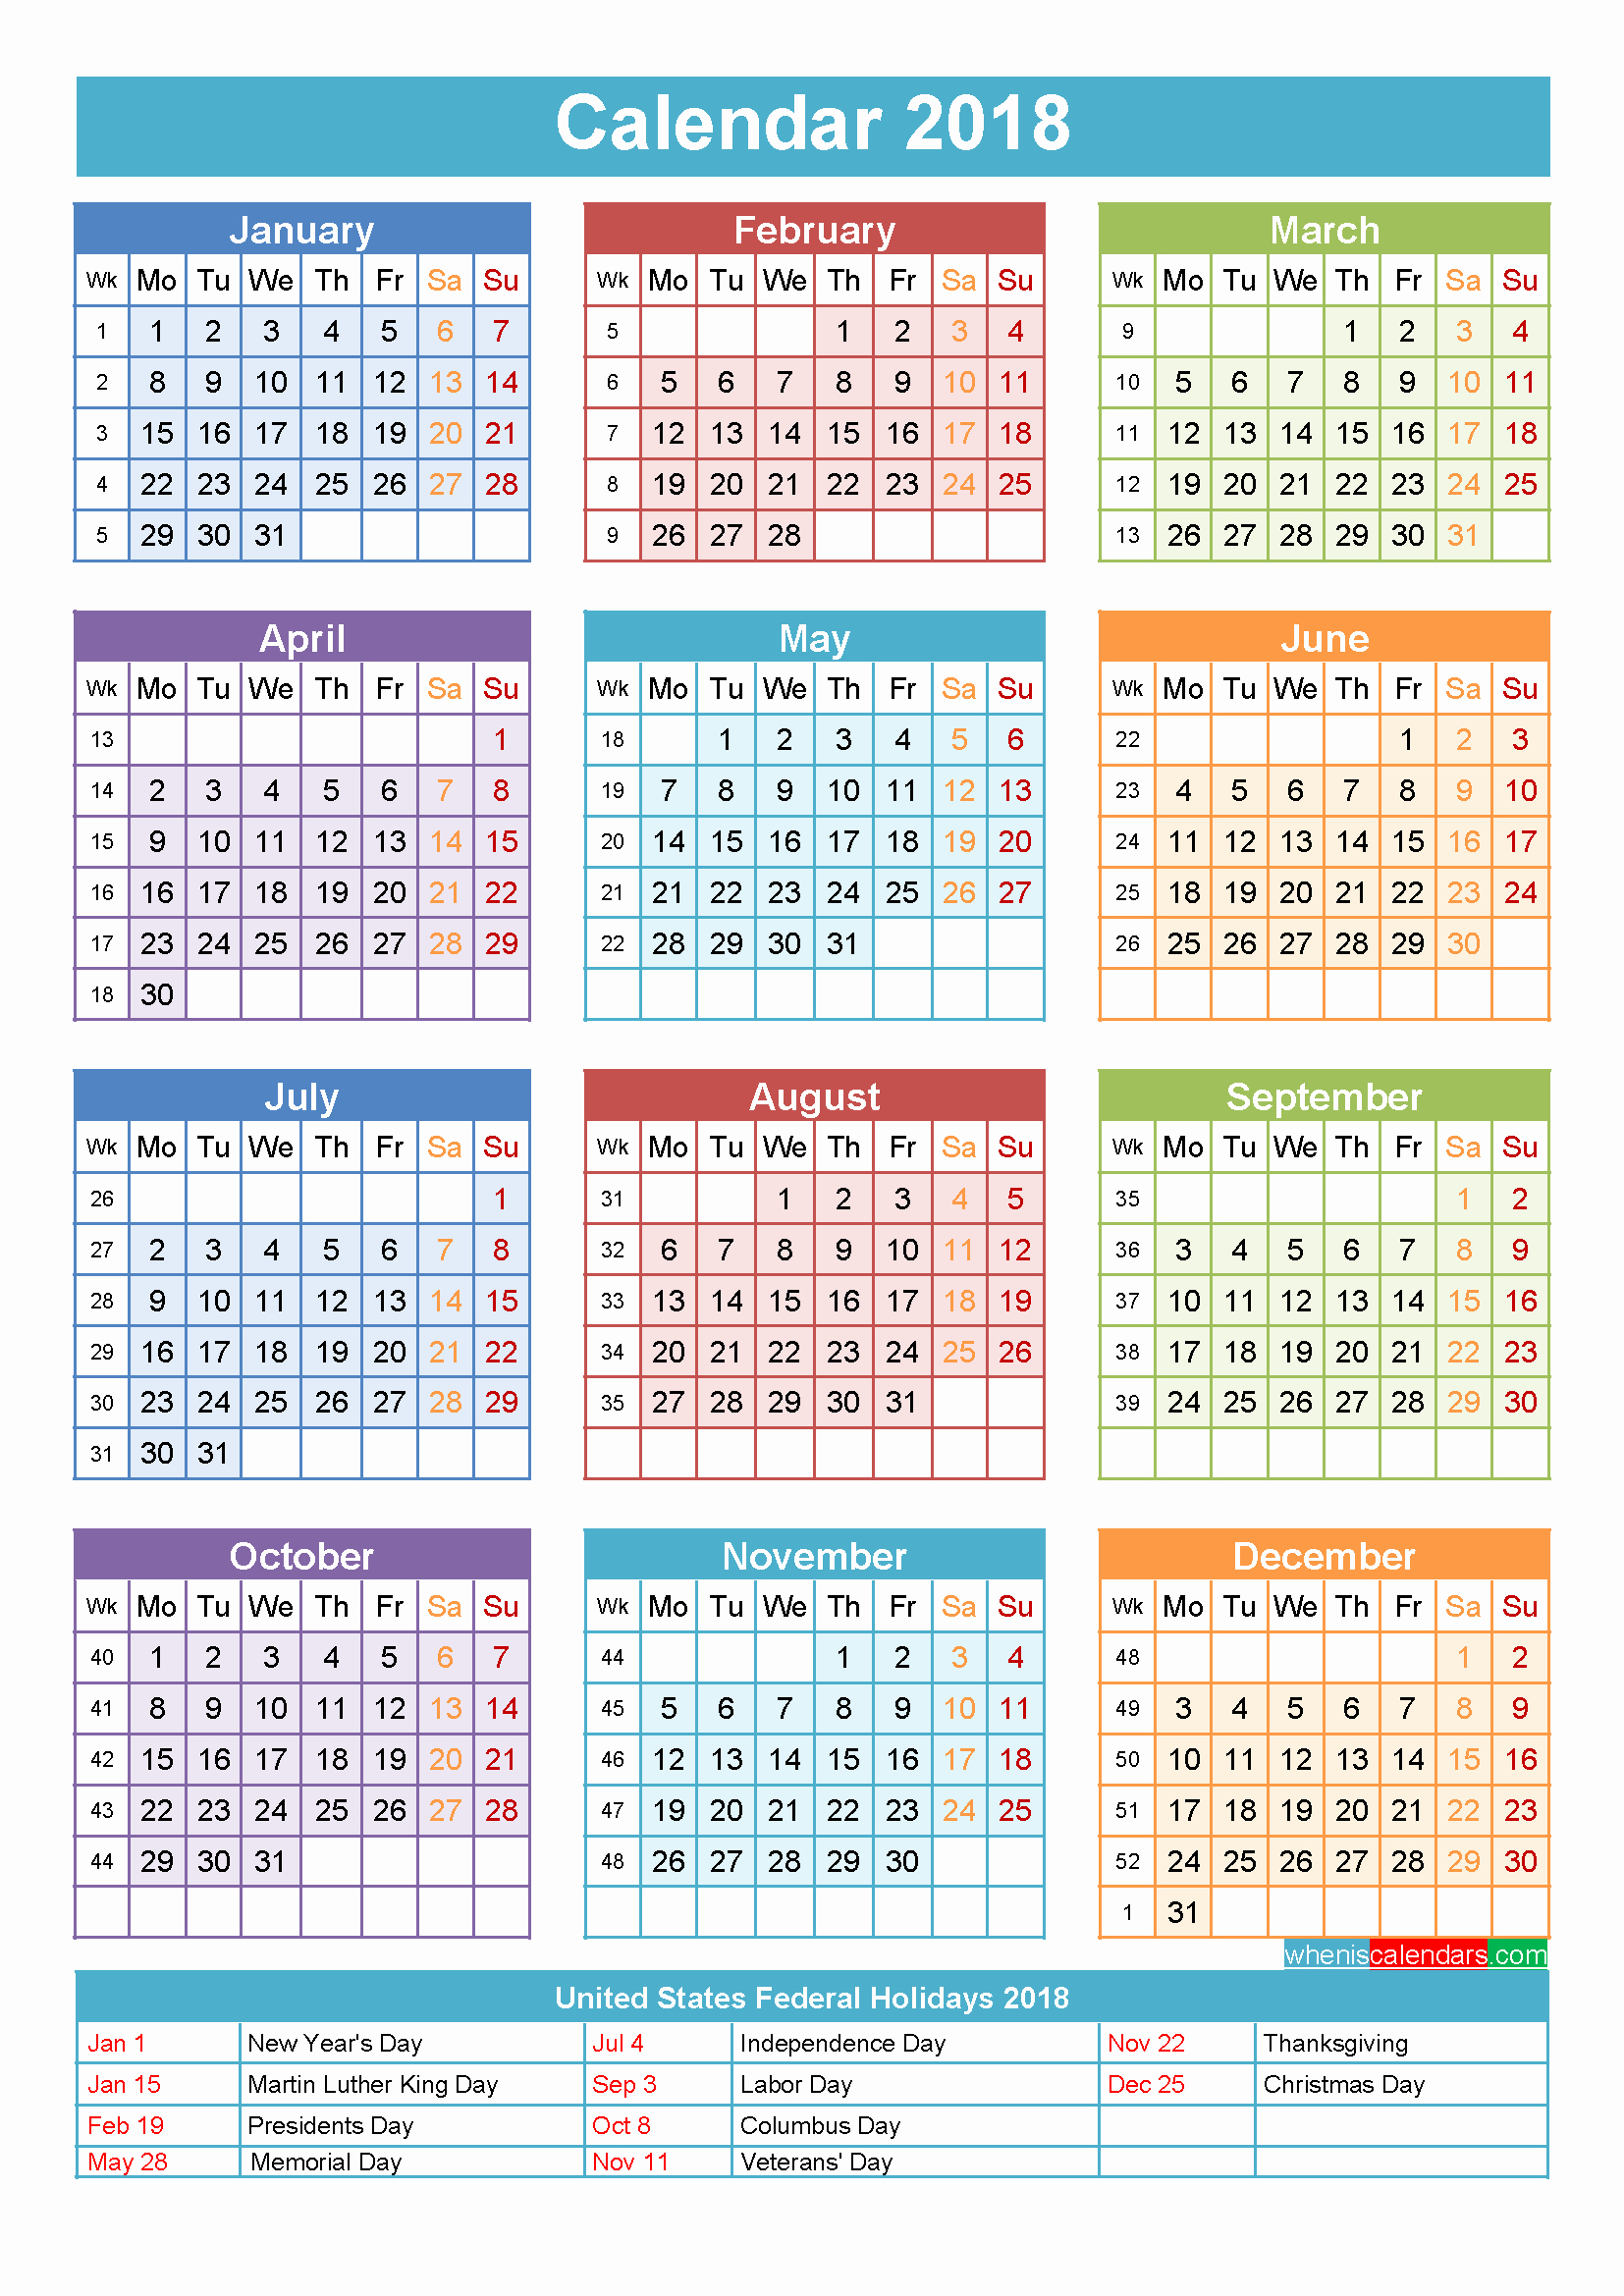 Calendar 2018 Printable with Holidays Beautiful 2018 Calendar with Holidays